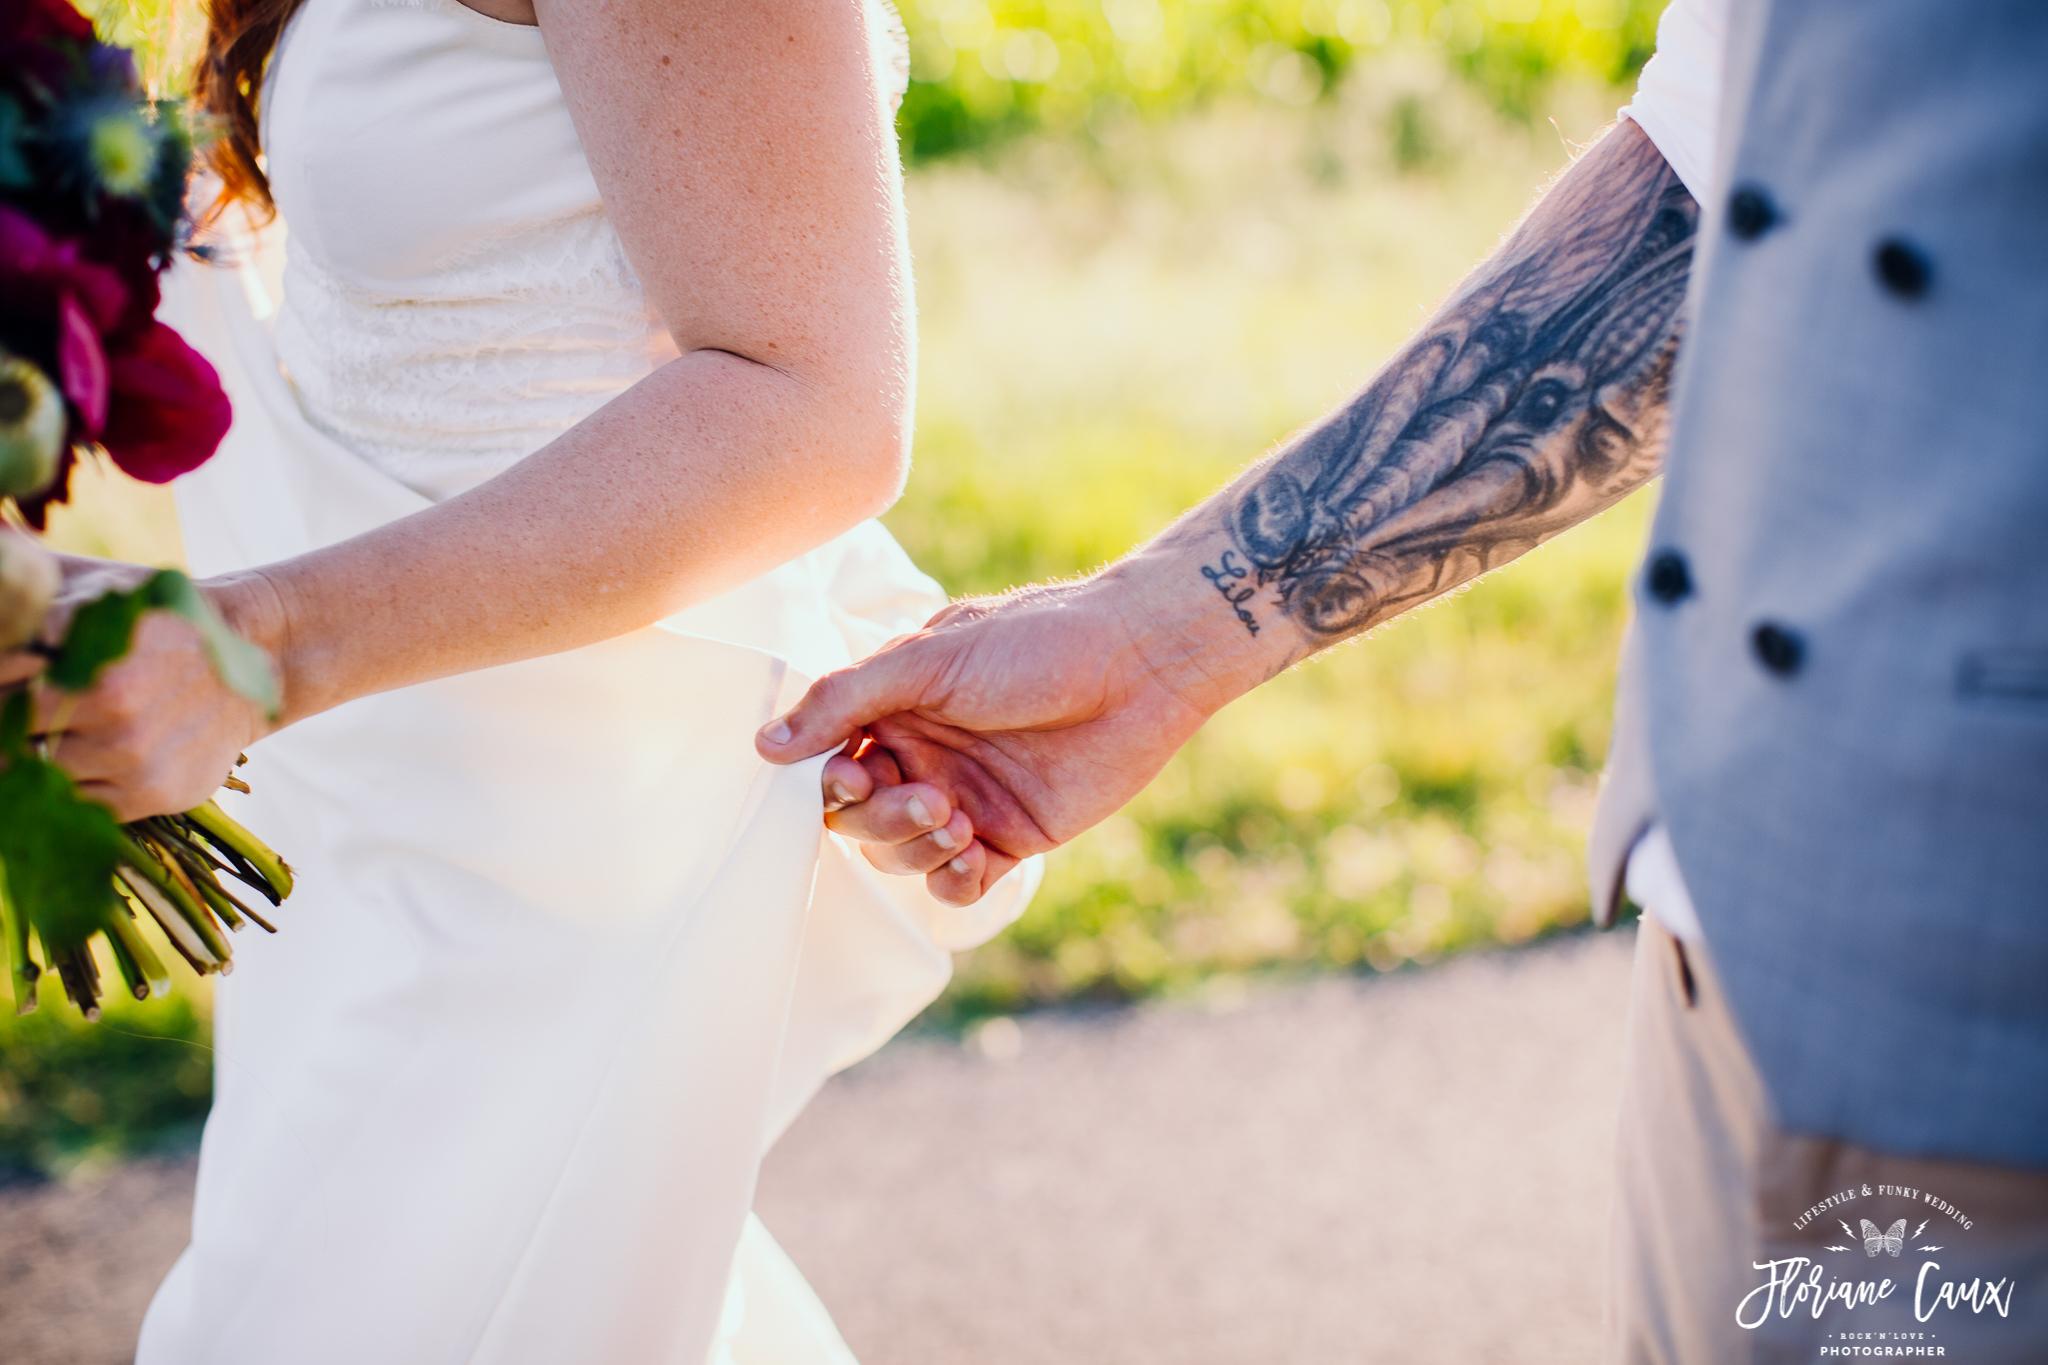 photographe-mariage-toulouse-rocknroll-maries-tatoues-floriane-caux-61